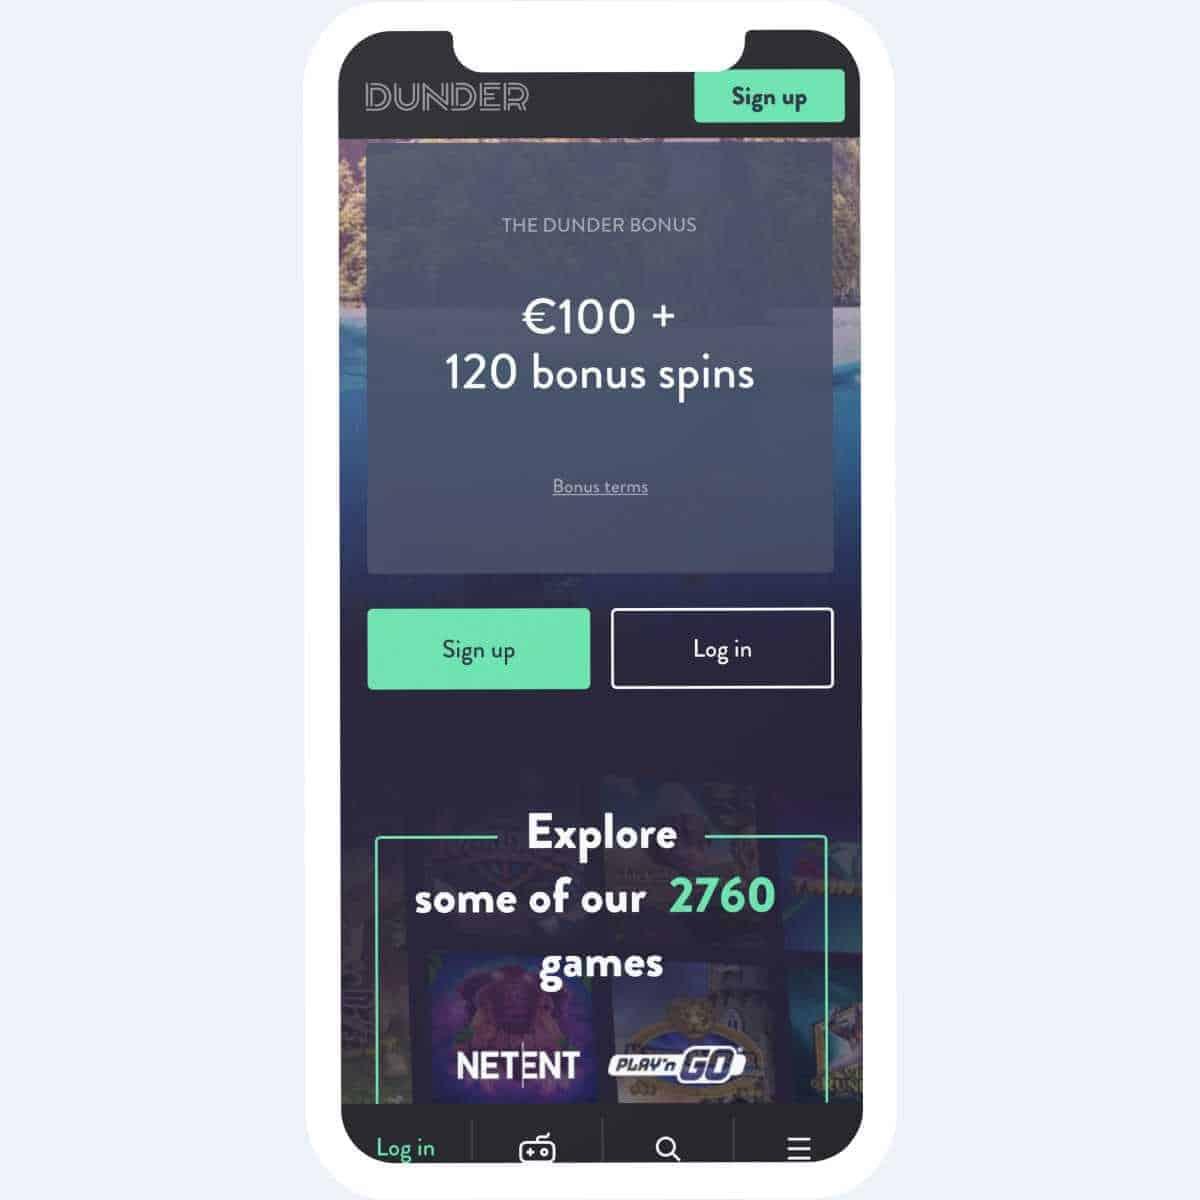 dunder welcome bonus mobile